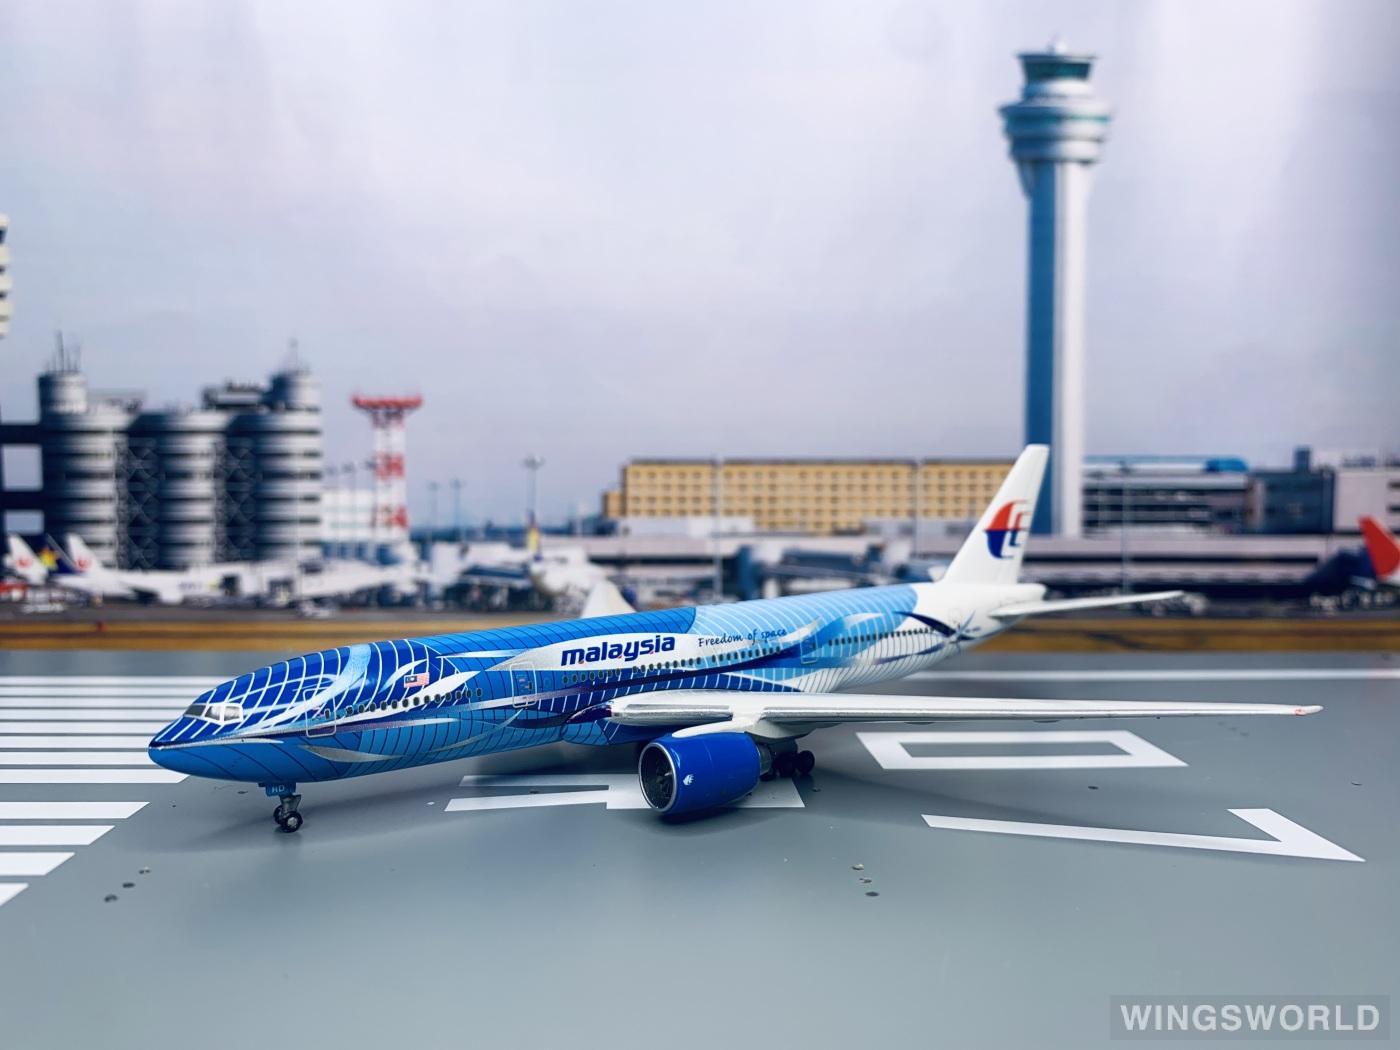 Geminijets 1:400 88207 Malaysia Airlines 马来西亚航空 Boeing 777-200 9M-MRD